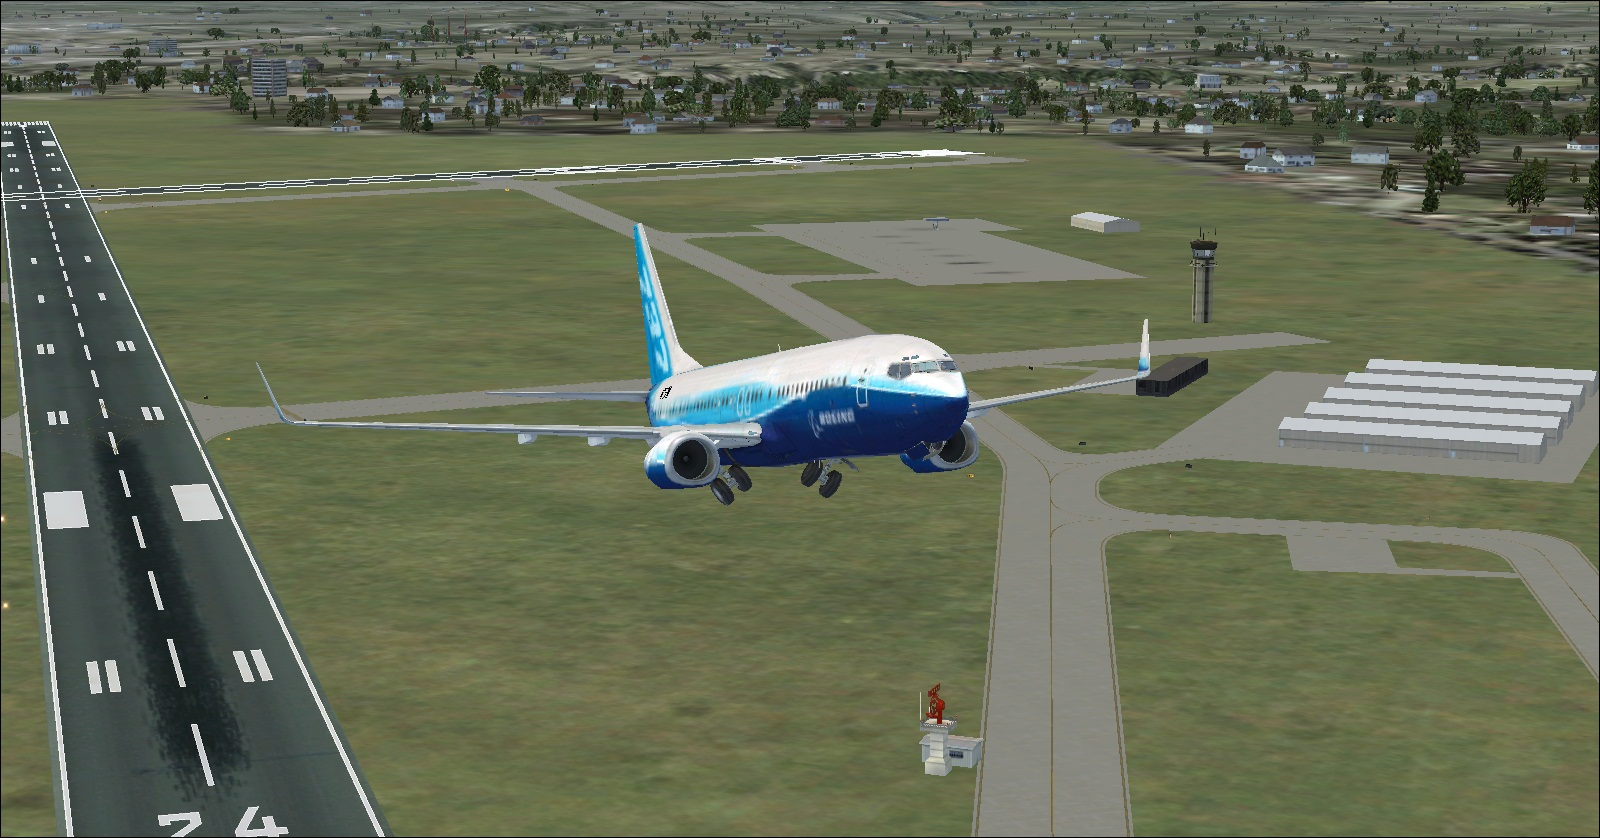 Boeing 737-800 fmc simulator - ghabinbime